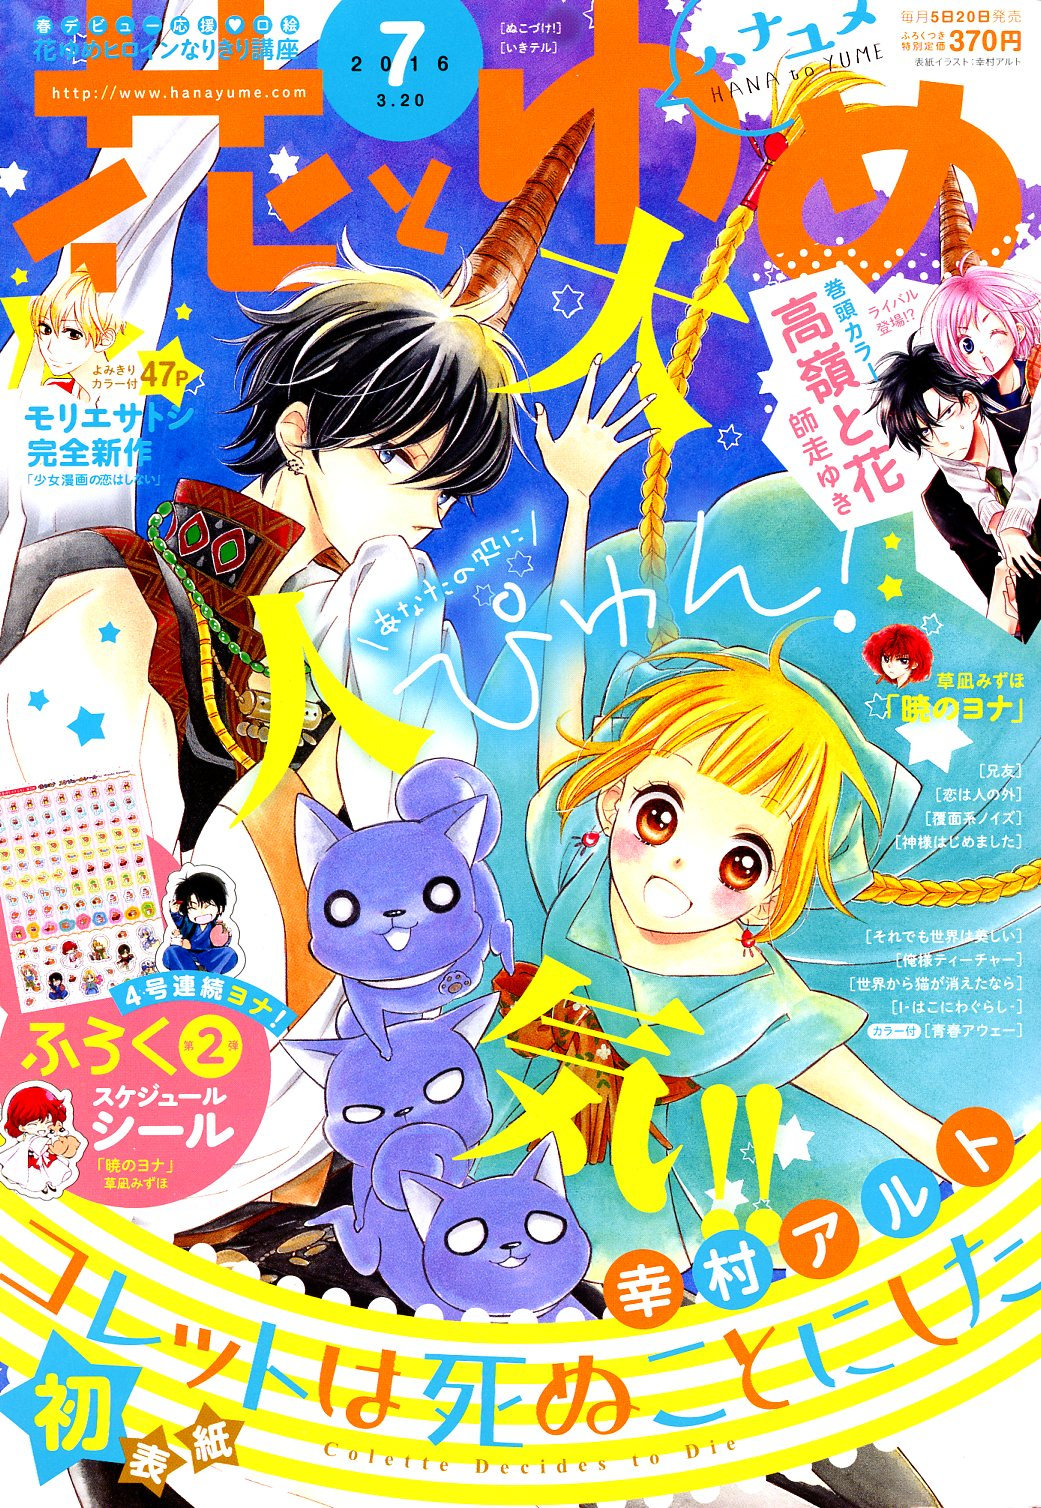 ◕ ‿ ◕。 Official Shoujo Thread 。◕ ‿ ◕。 - Manga - OneHallyu